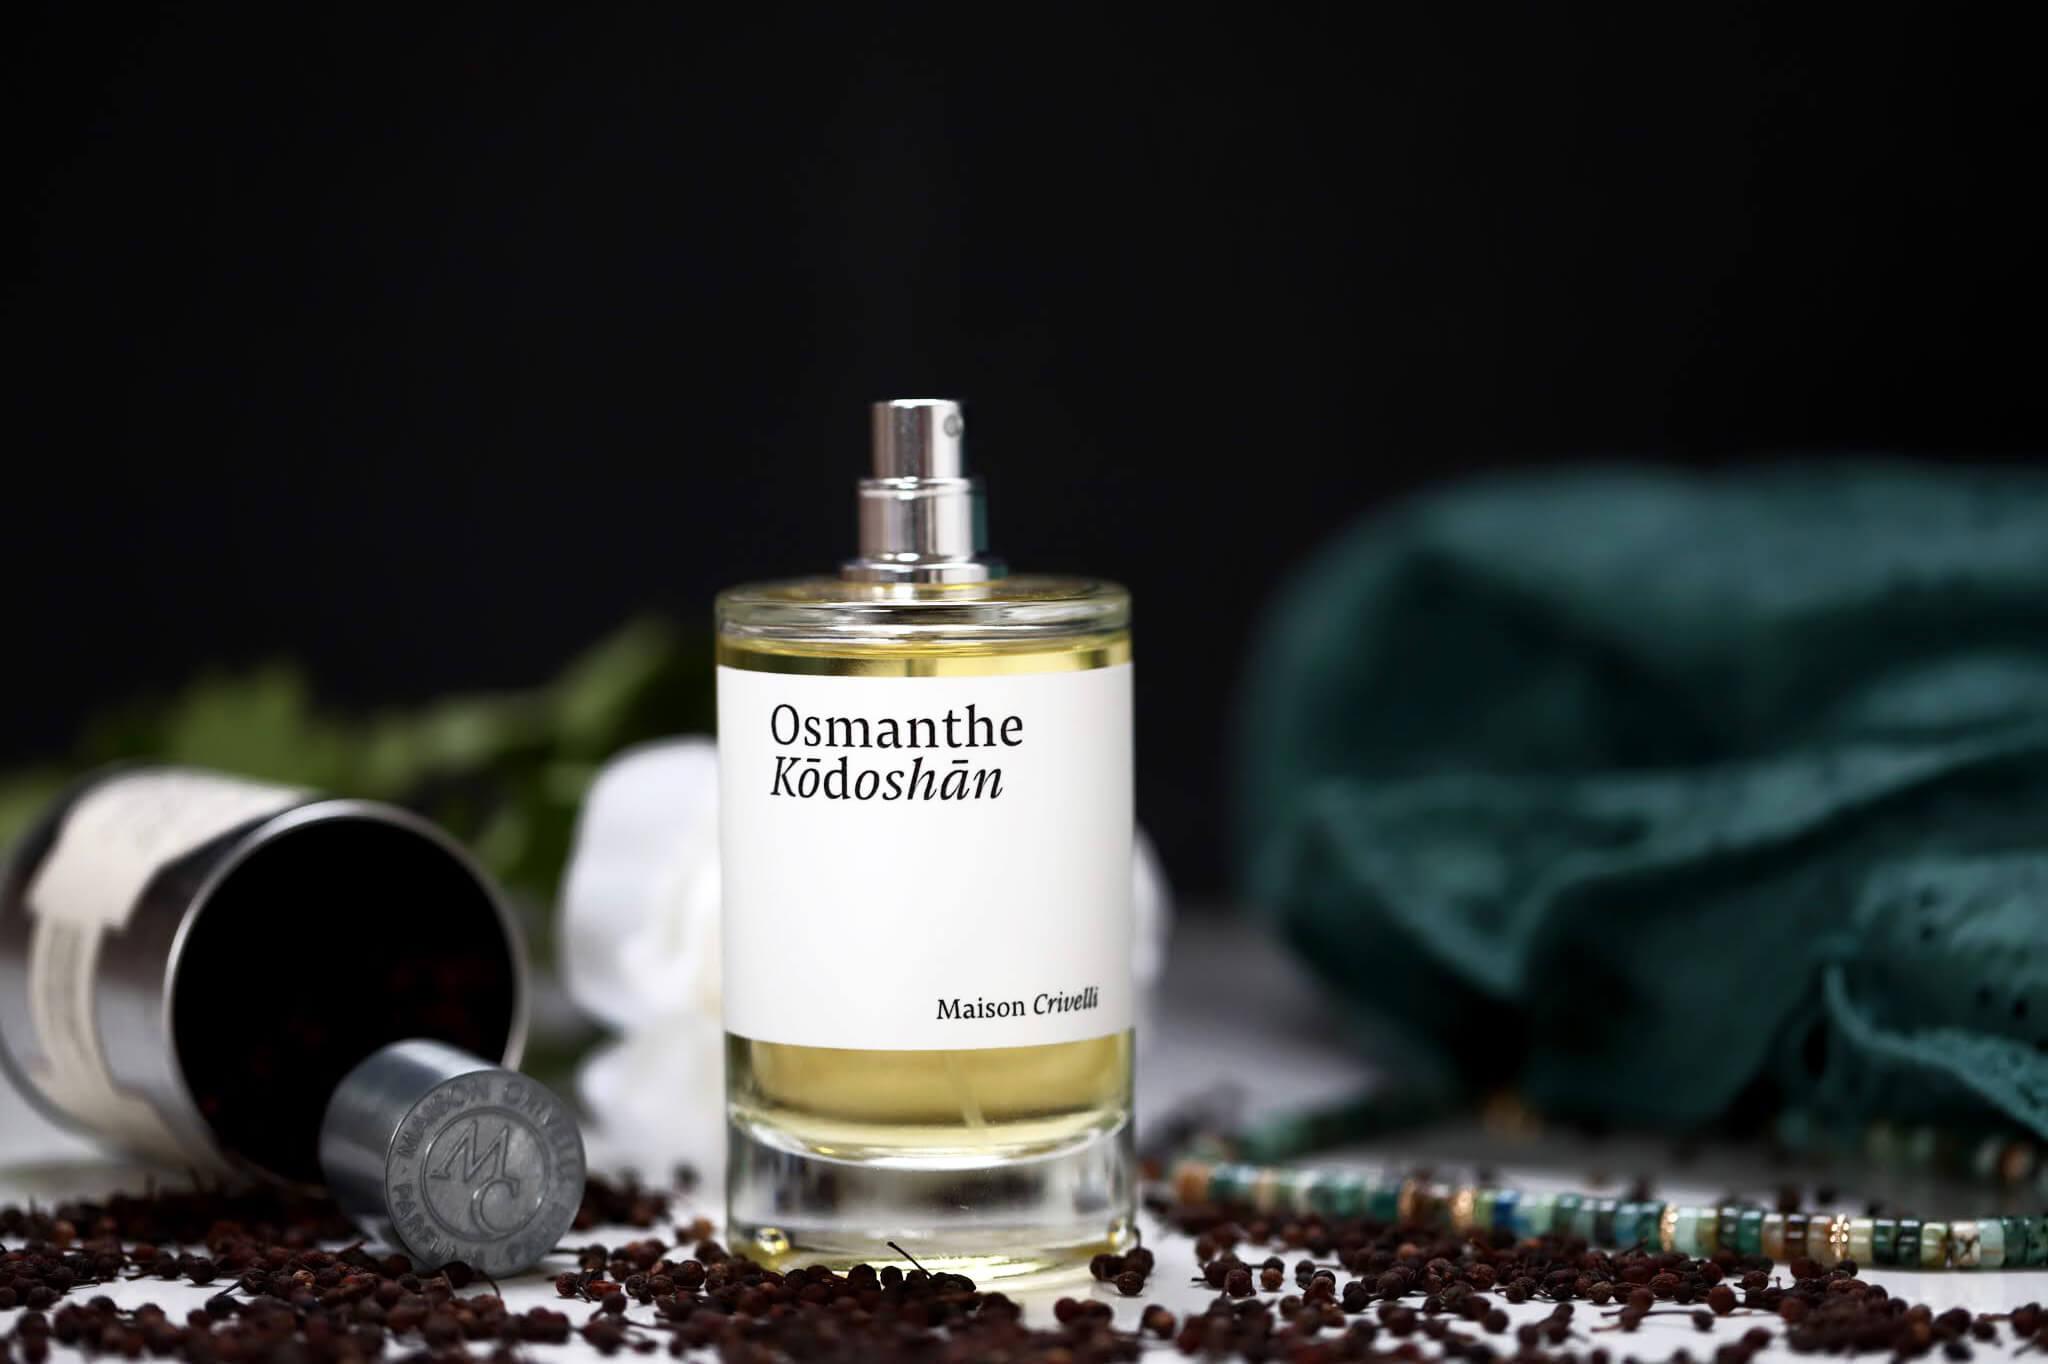 Maison Crivelli Osmanthe Kodoshan Parfum